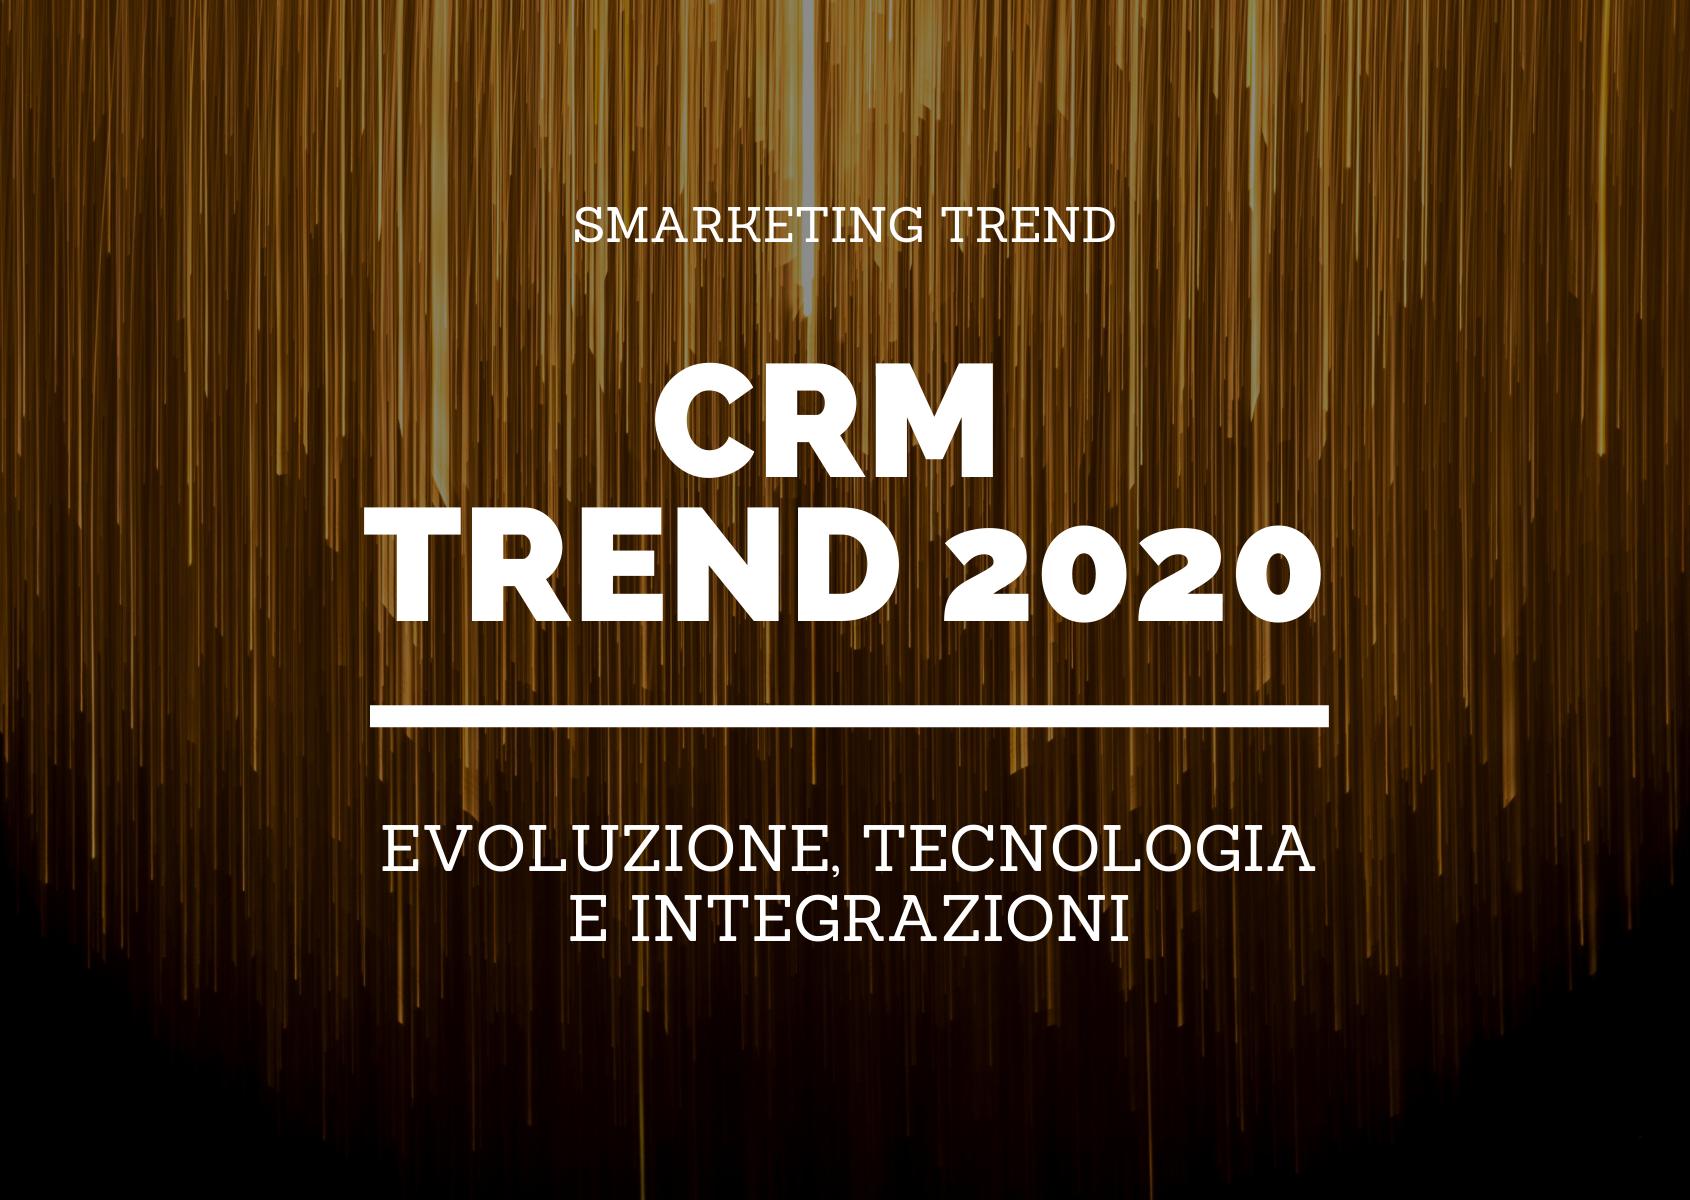 CRM trend 2020